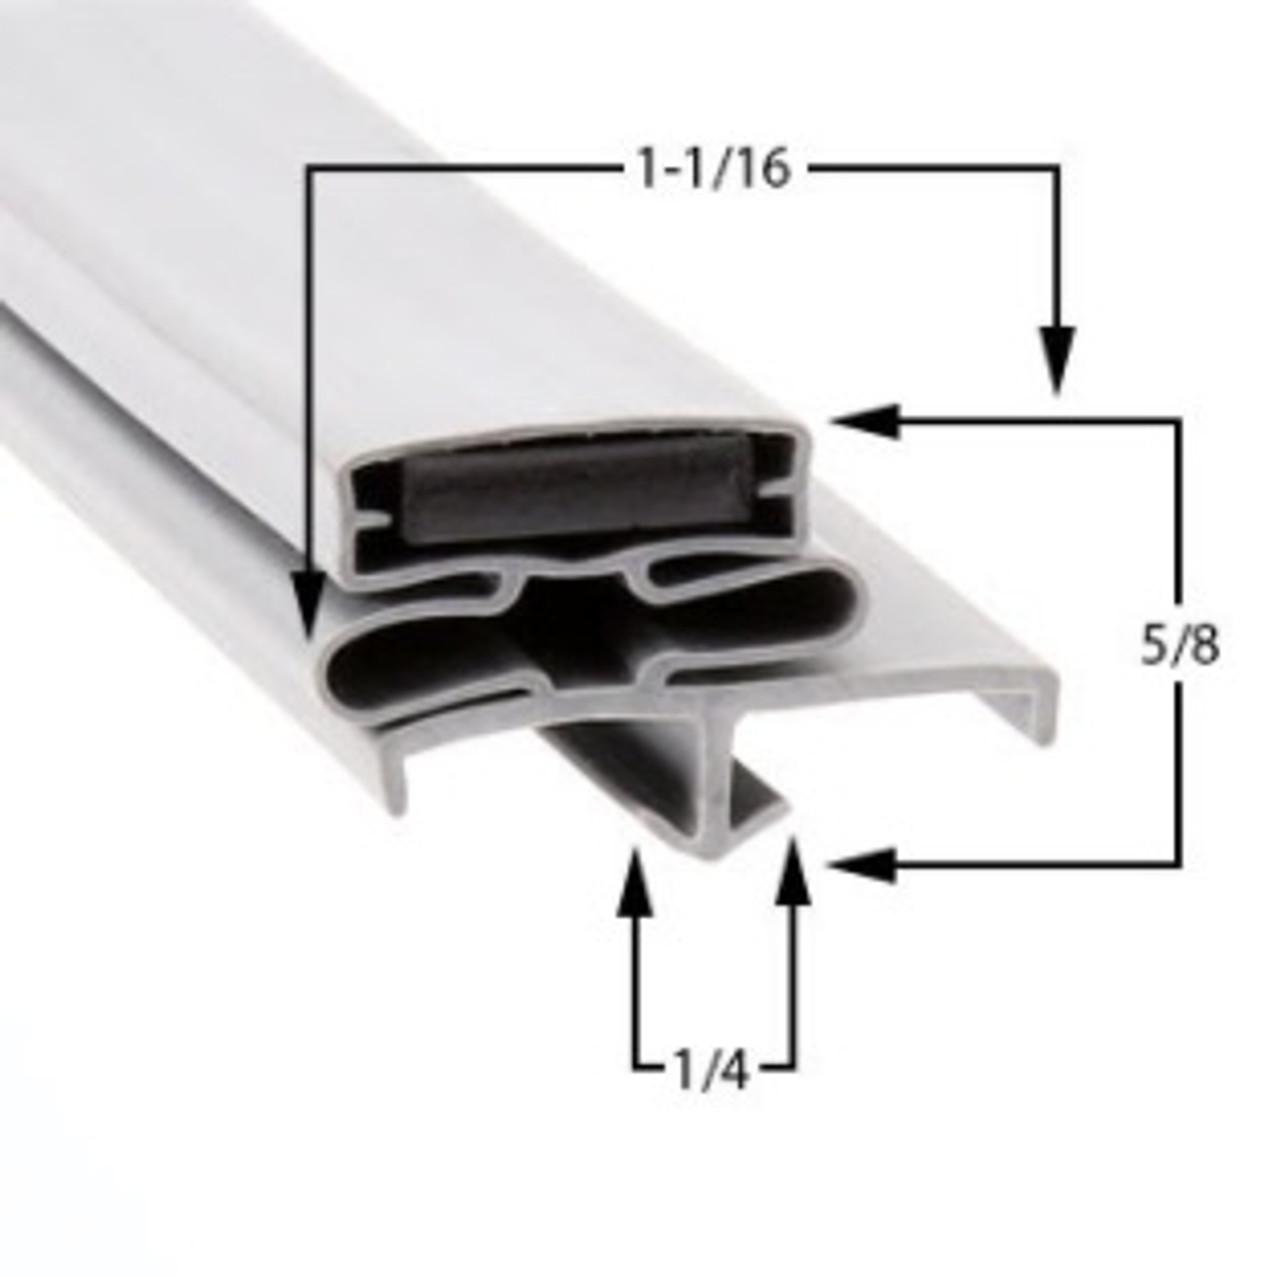 Delfield Door Gasket Profile 168 22 7/8 x 28 1/4 -A2.0880, 170-2302-C-2